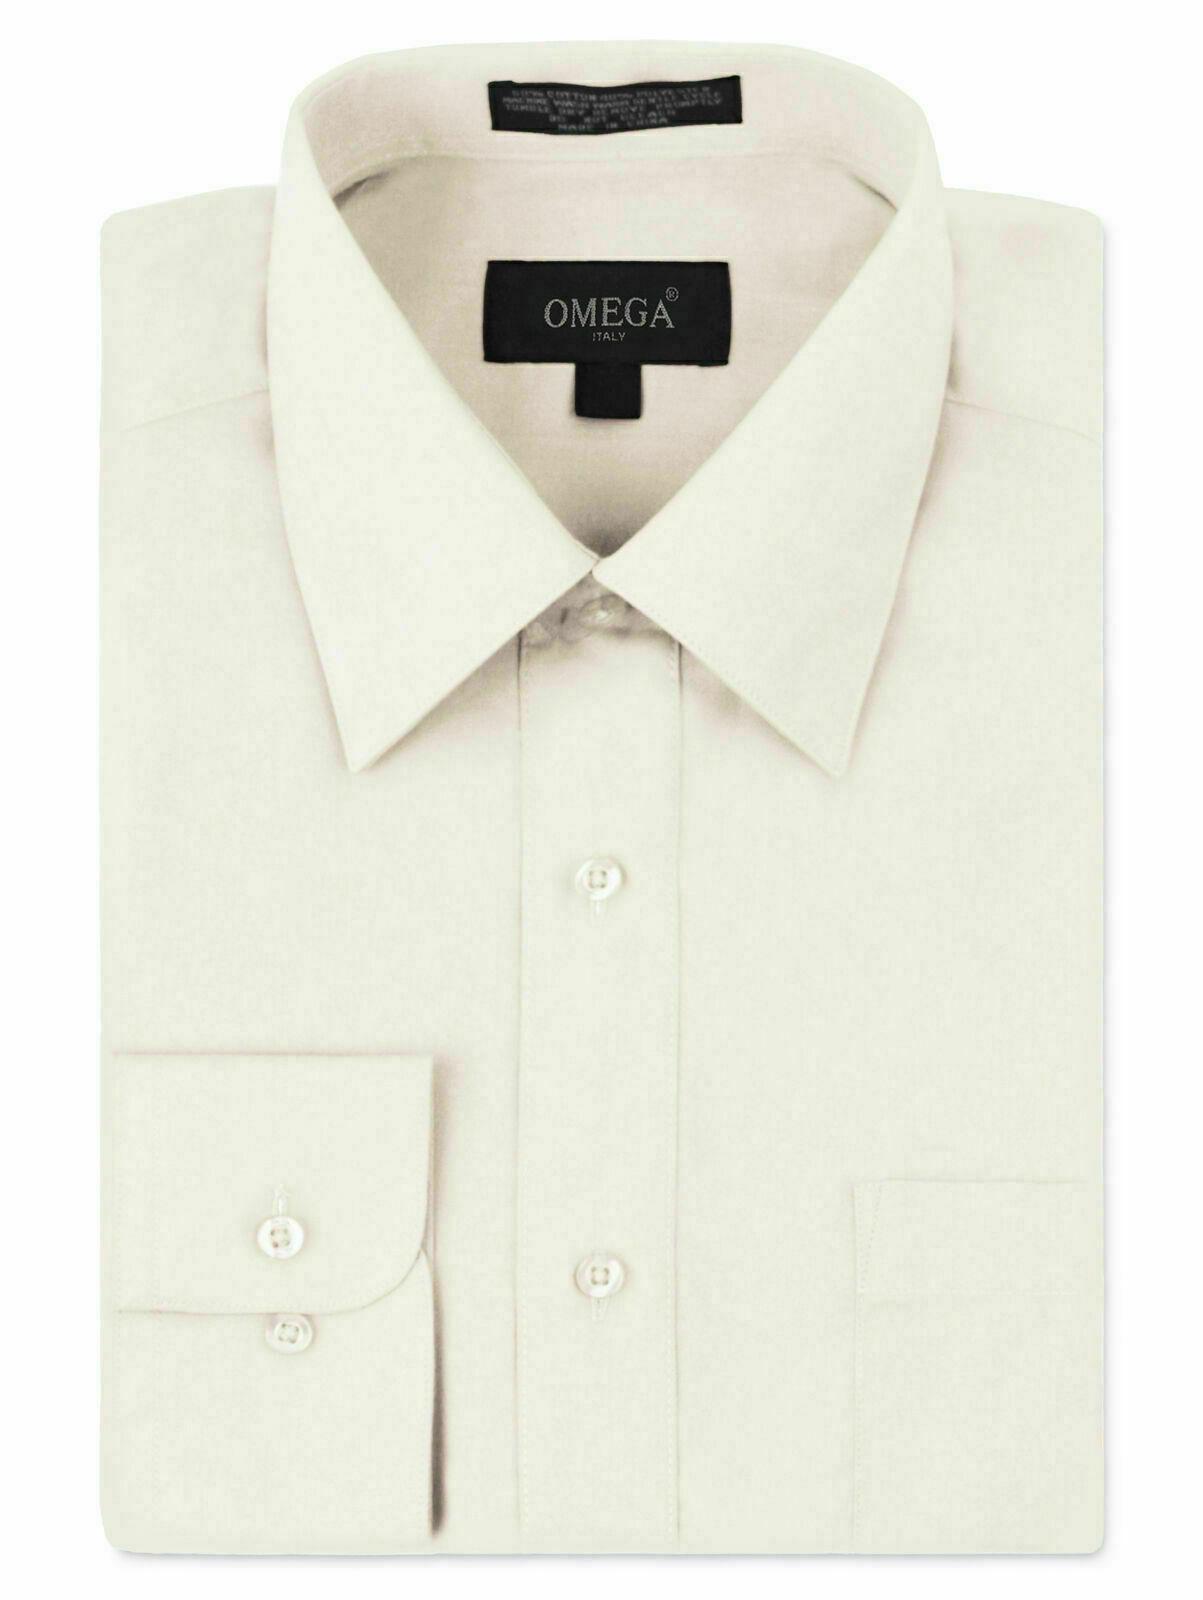 Omega Italy Men's Long Sleeve Solid Regular Fit Ivory Dress Shirt - 3XL